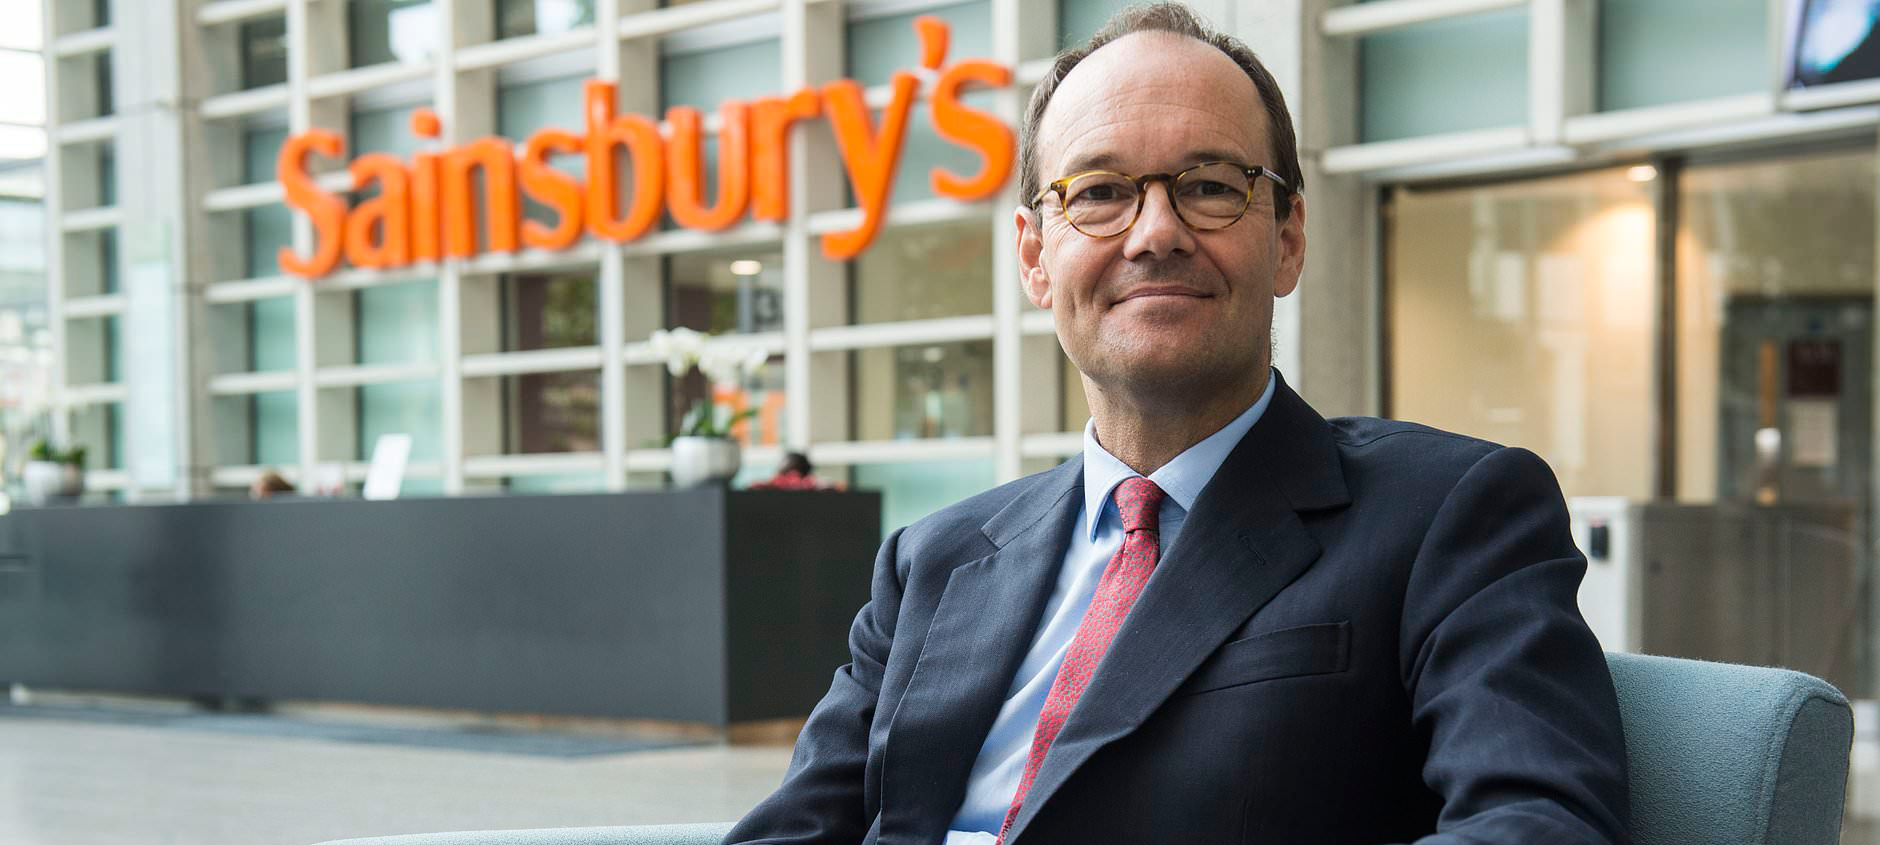 Mike Coupe - CEO J Sainsbury's PLC